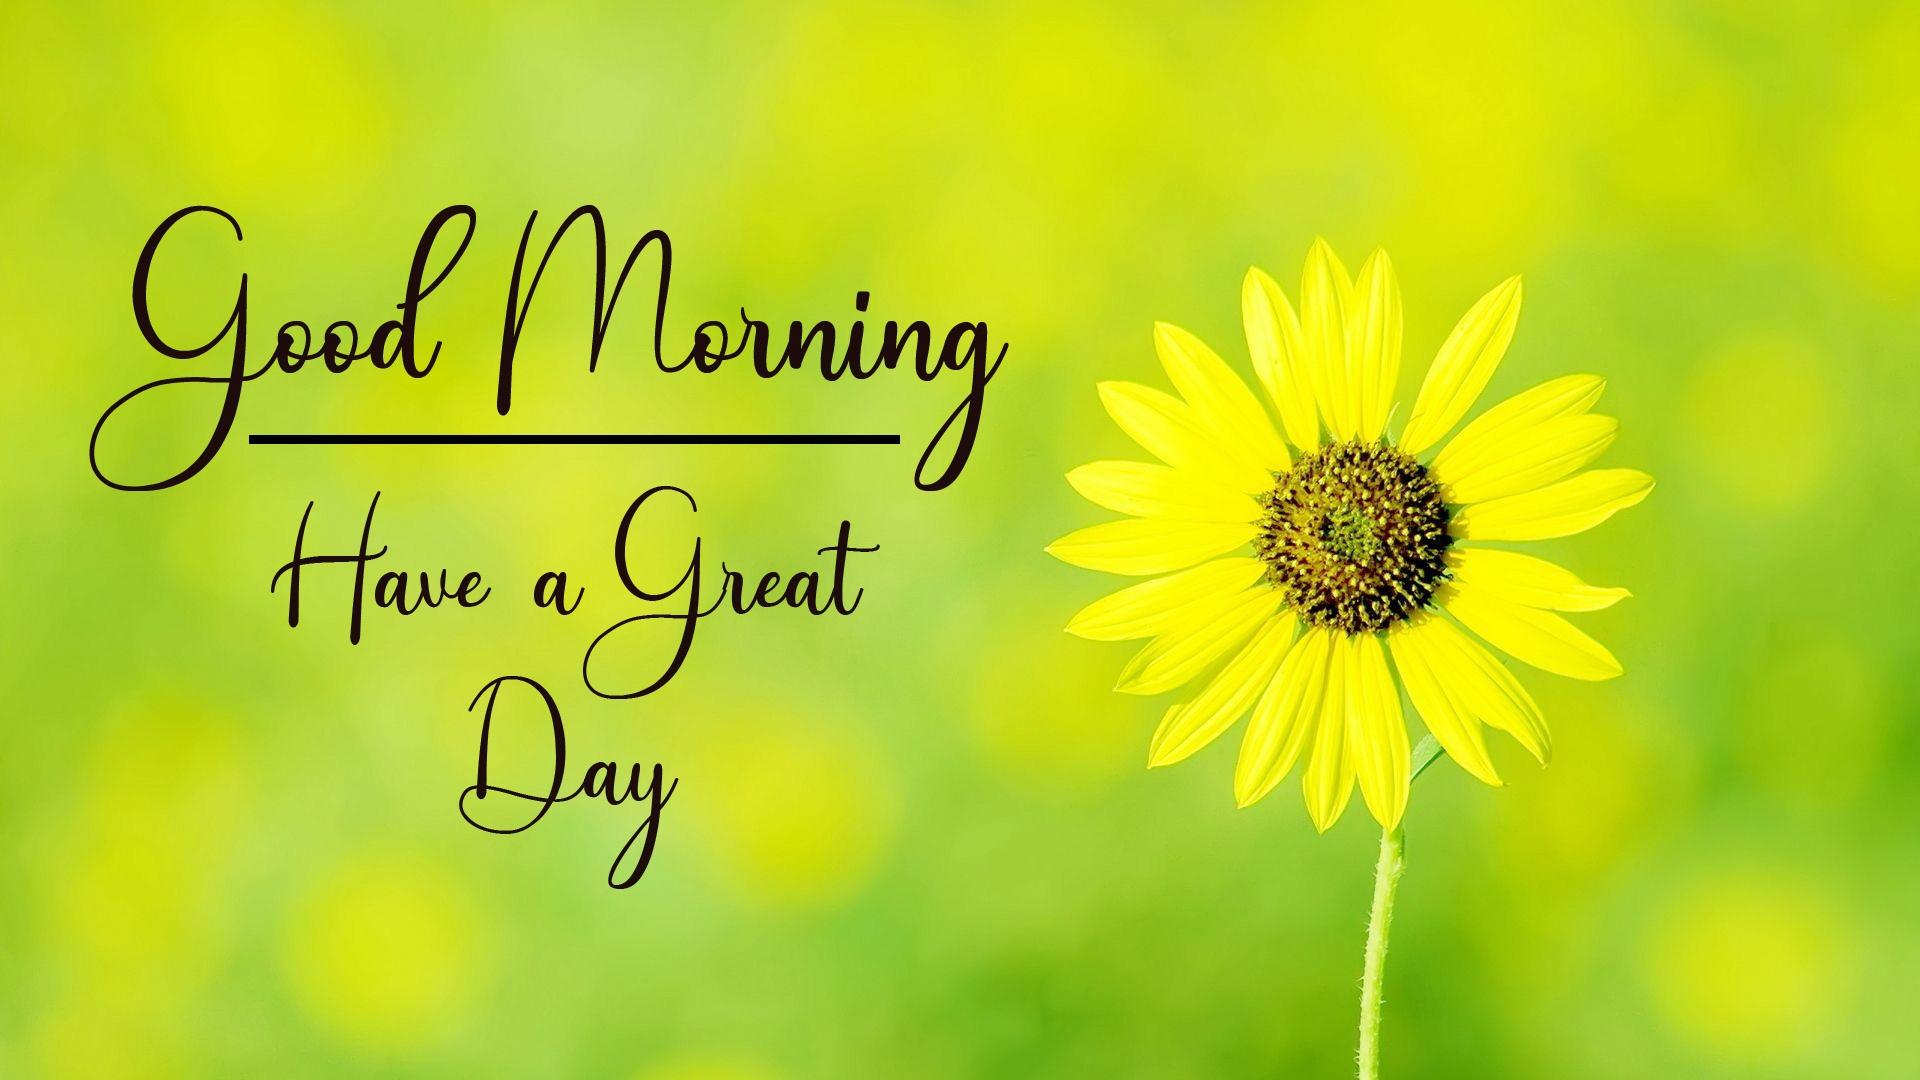 Good Morning Wallpaper New Download 1